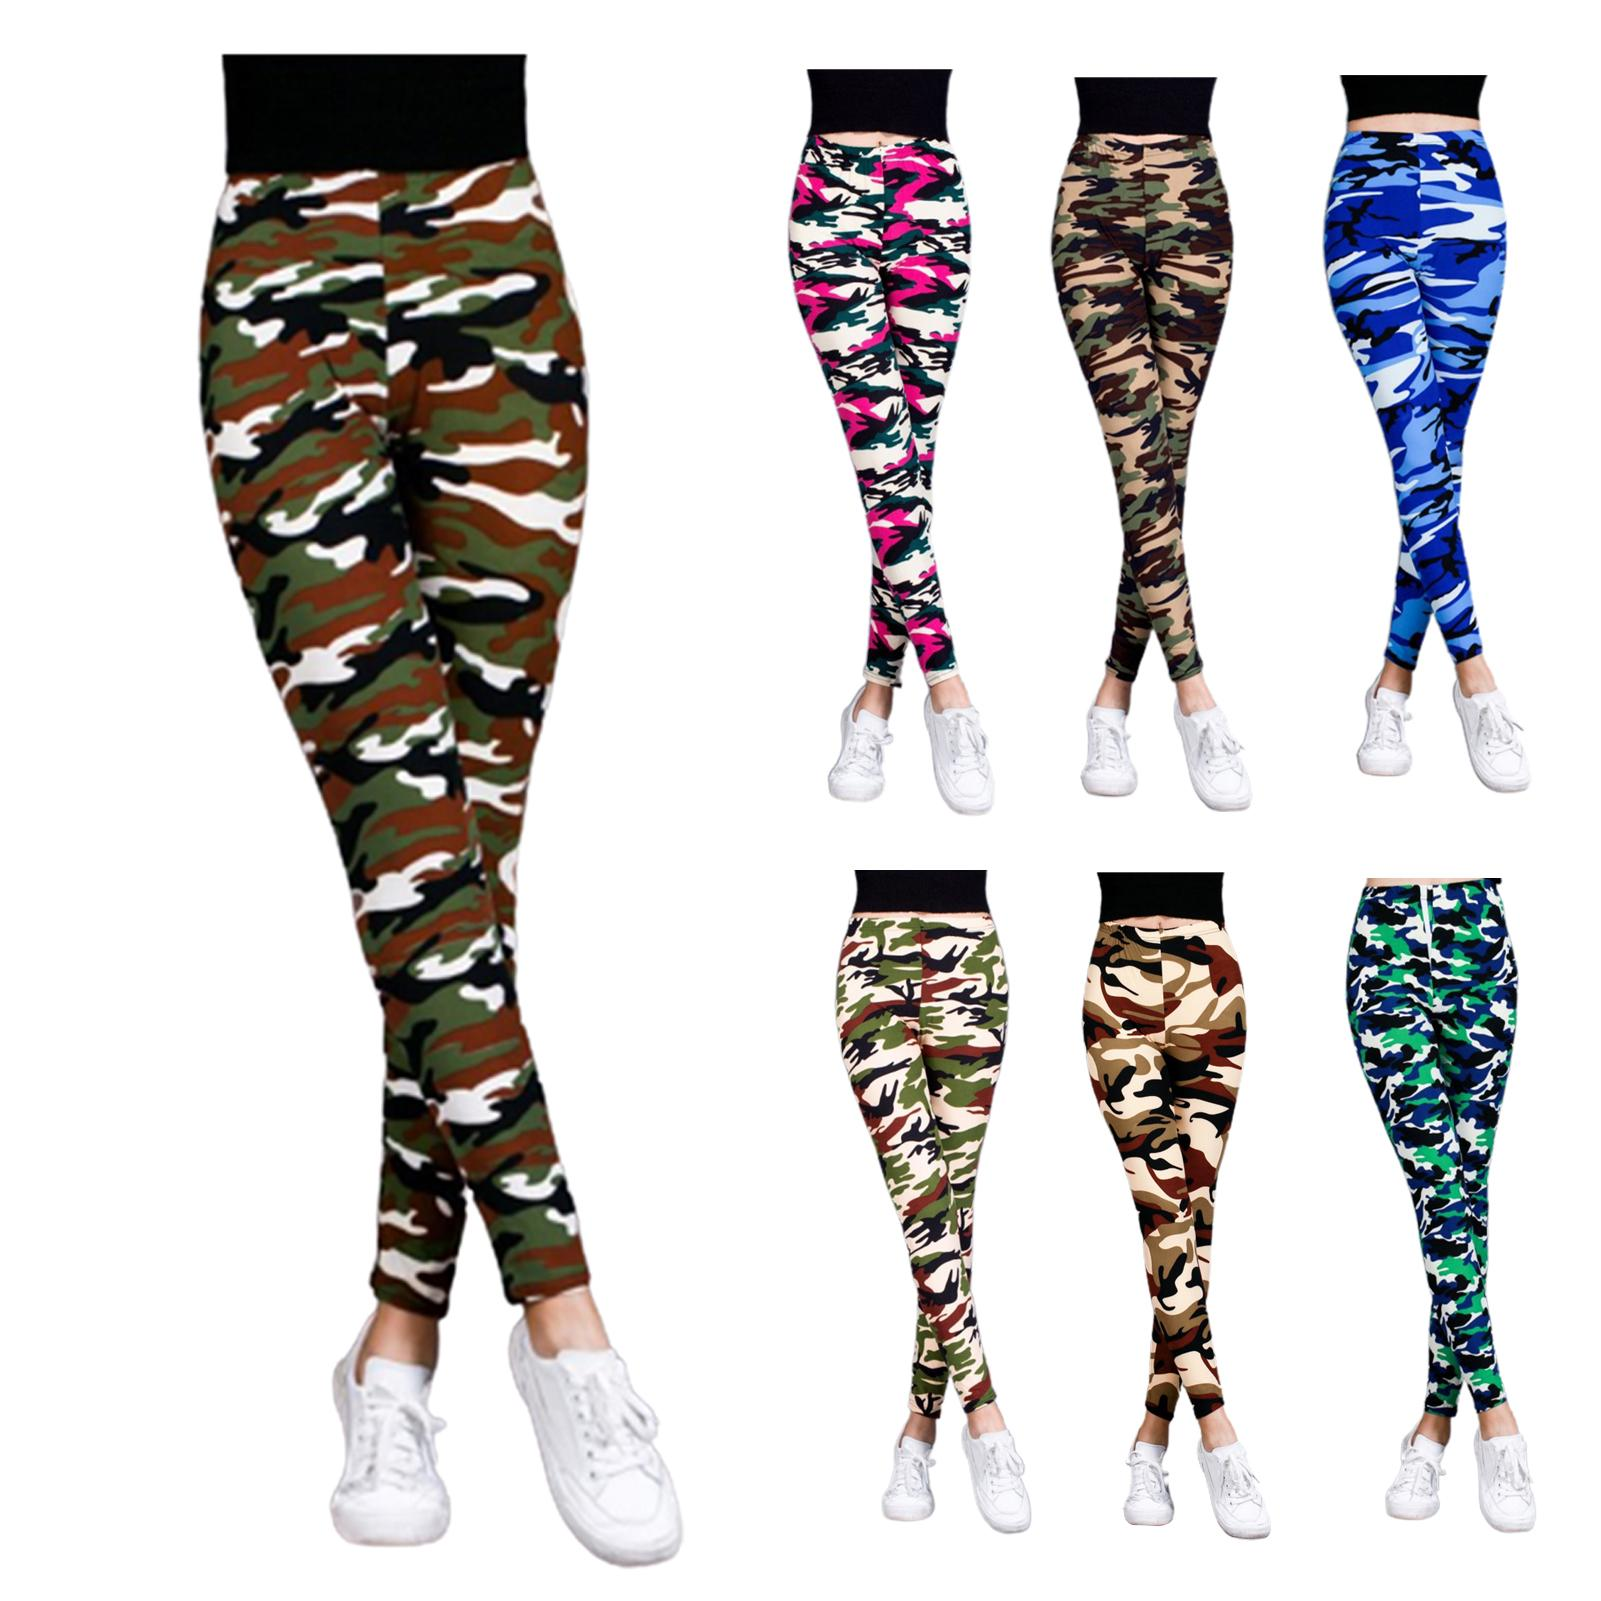 Women Camouflage Printed Ninth Pants Large Size High Waist Elastic SlimLegging Female Girls Gym Fitness Jogging Sports Pants NEW